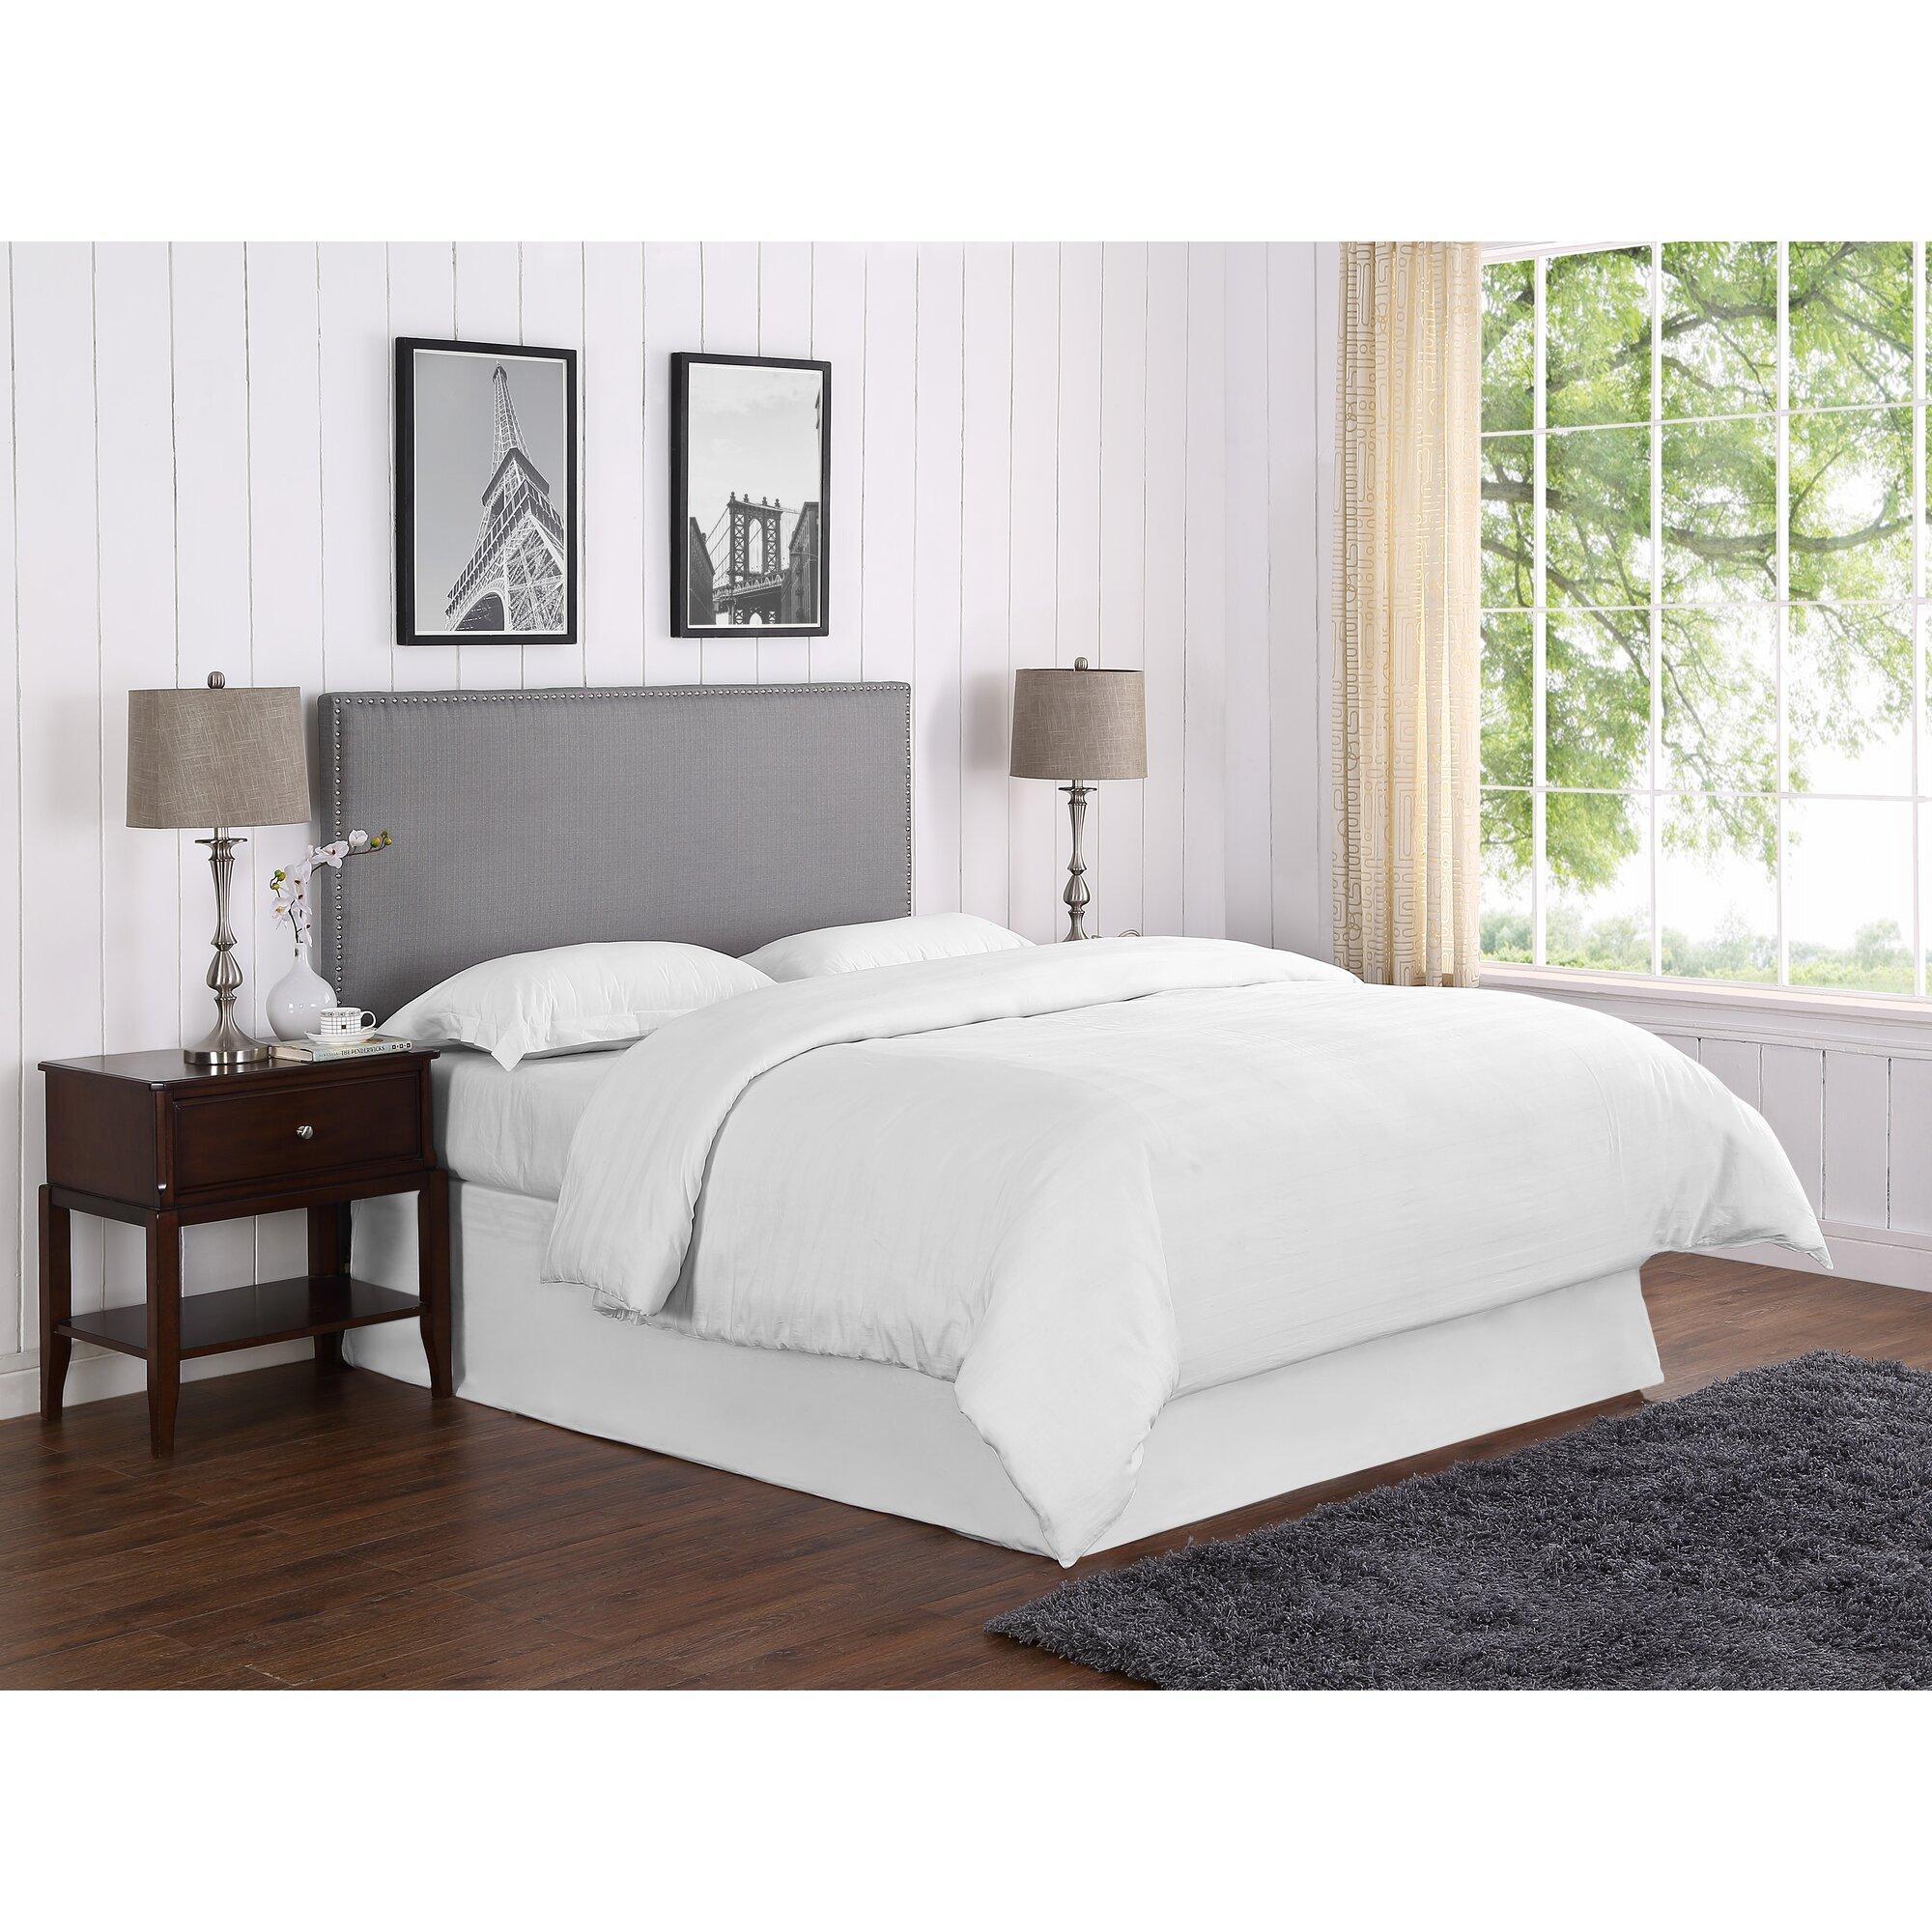 Bed headboard upholstered - Kimberley Upholstered Panel Headboard